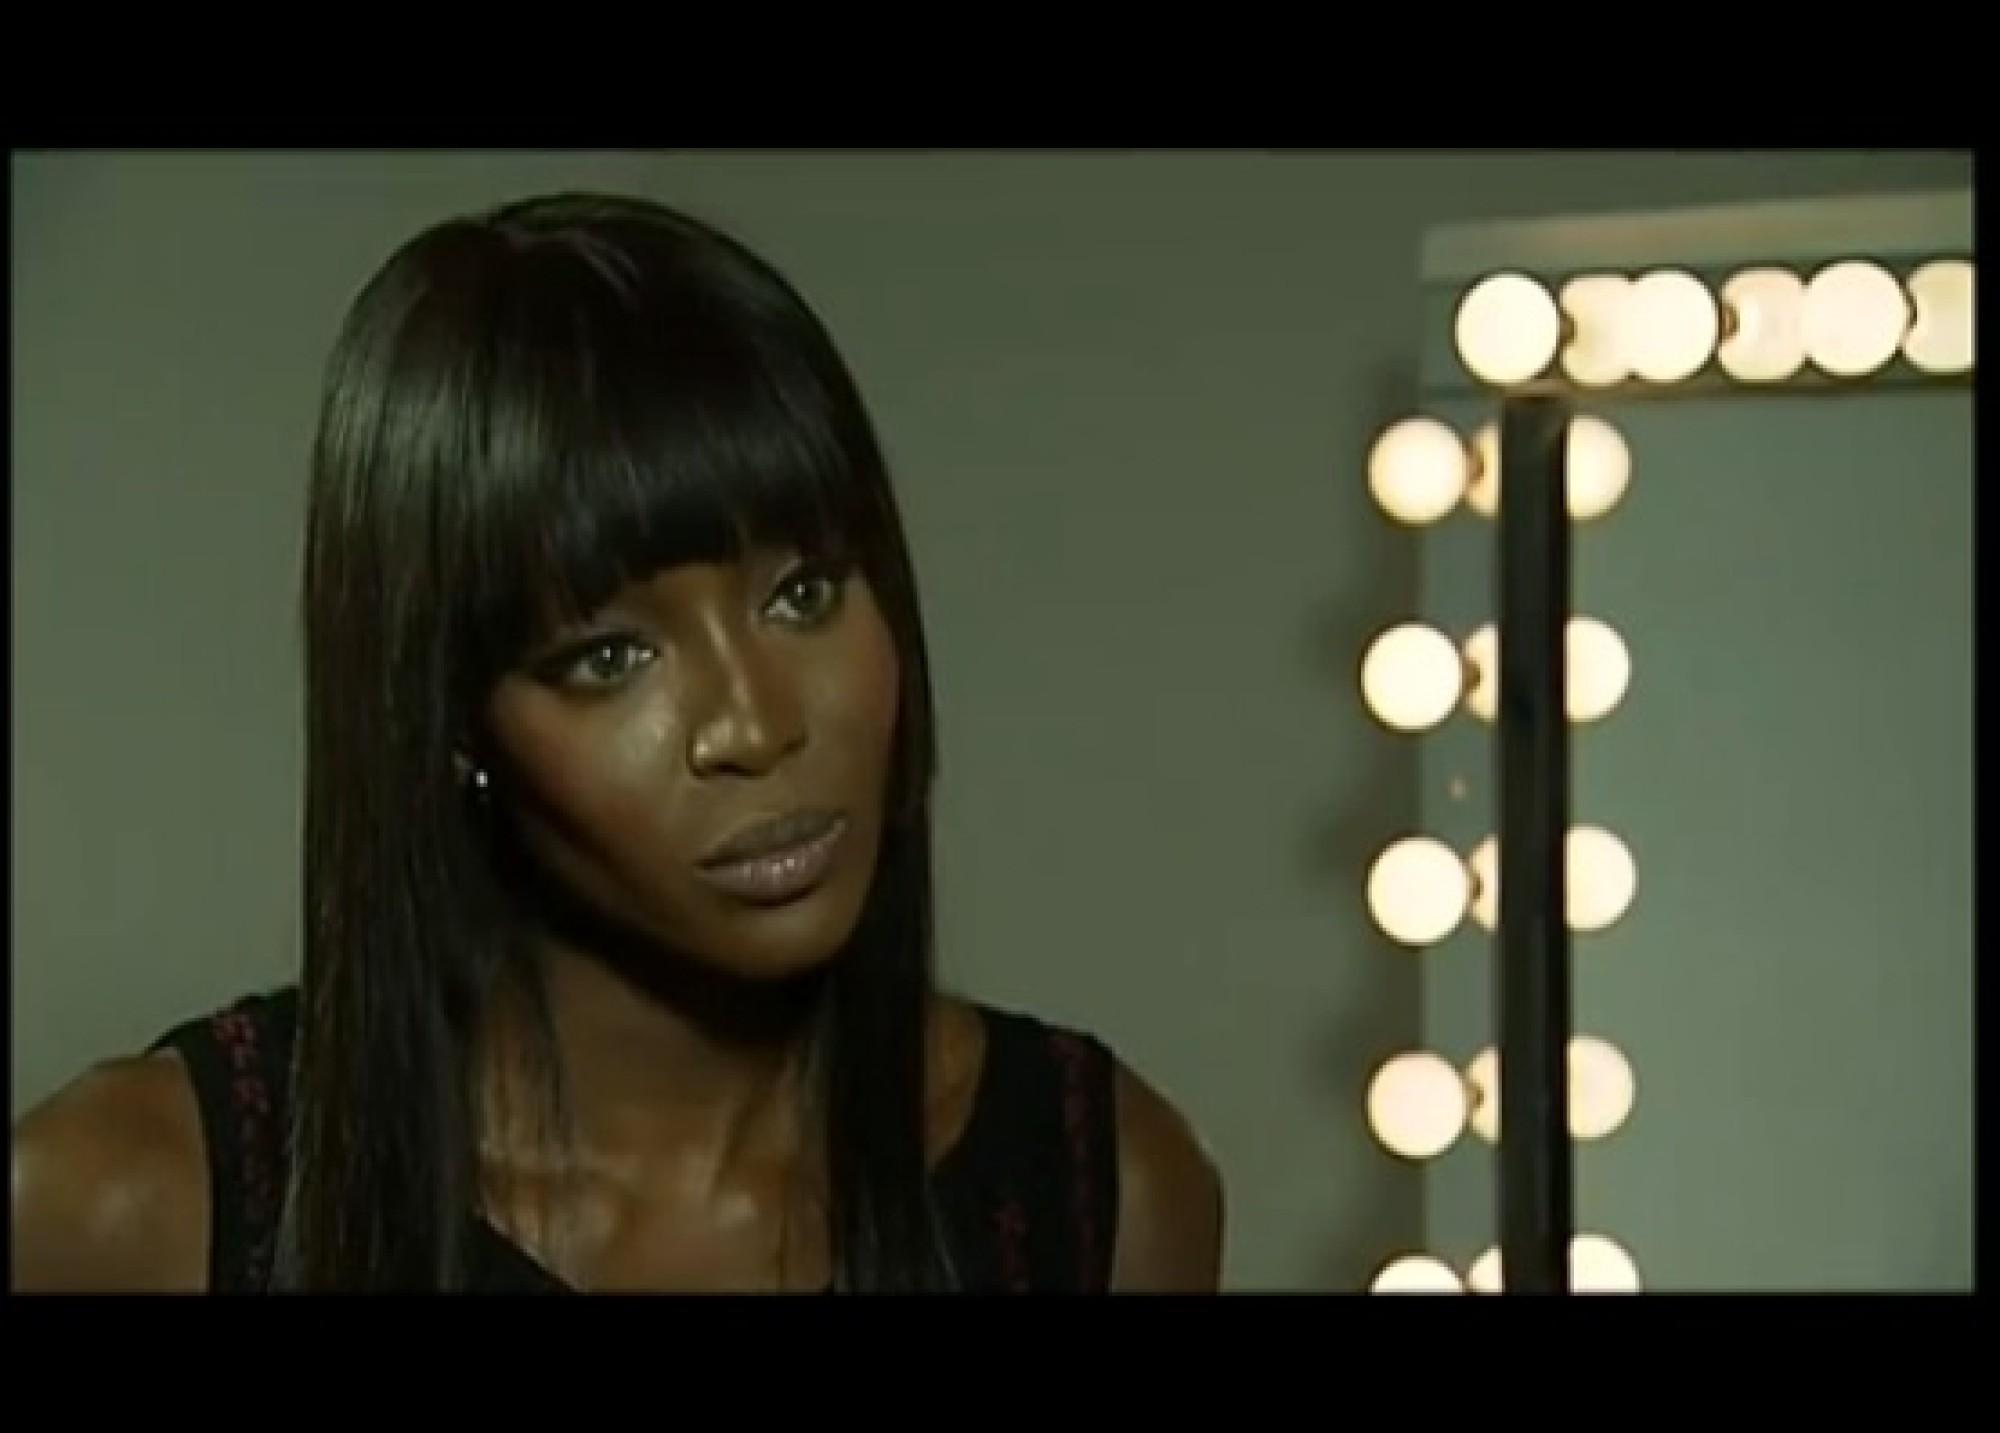 black angry girl meme black angry girl meme naomi cbell ...